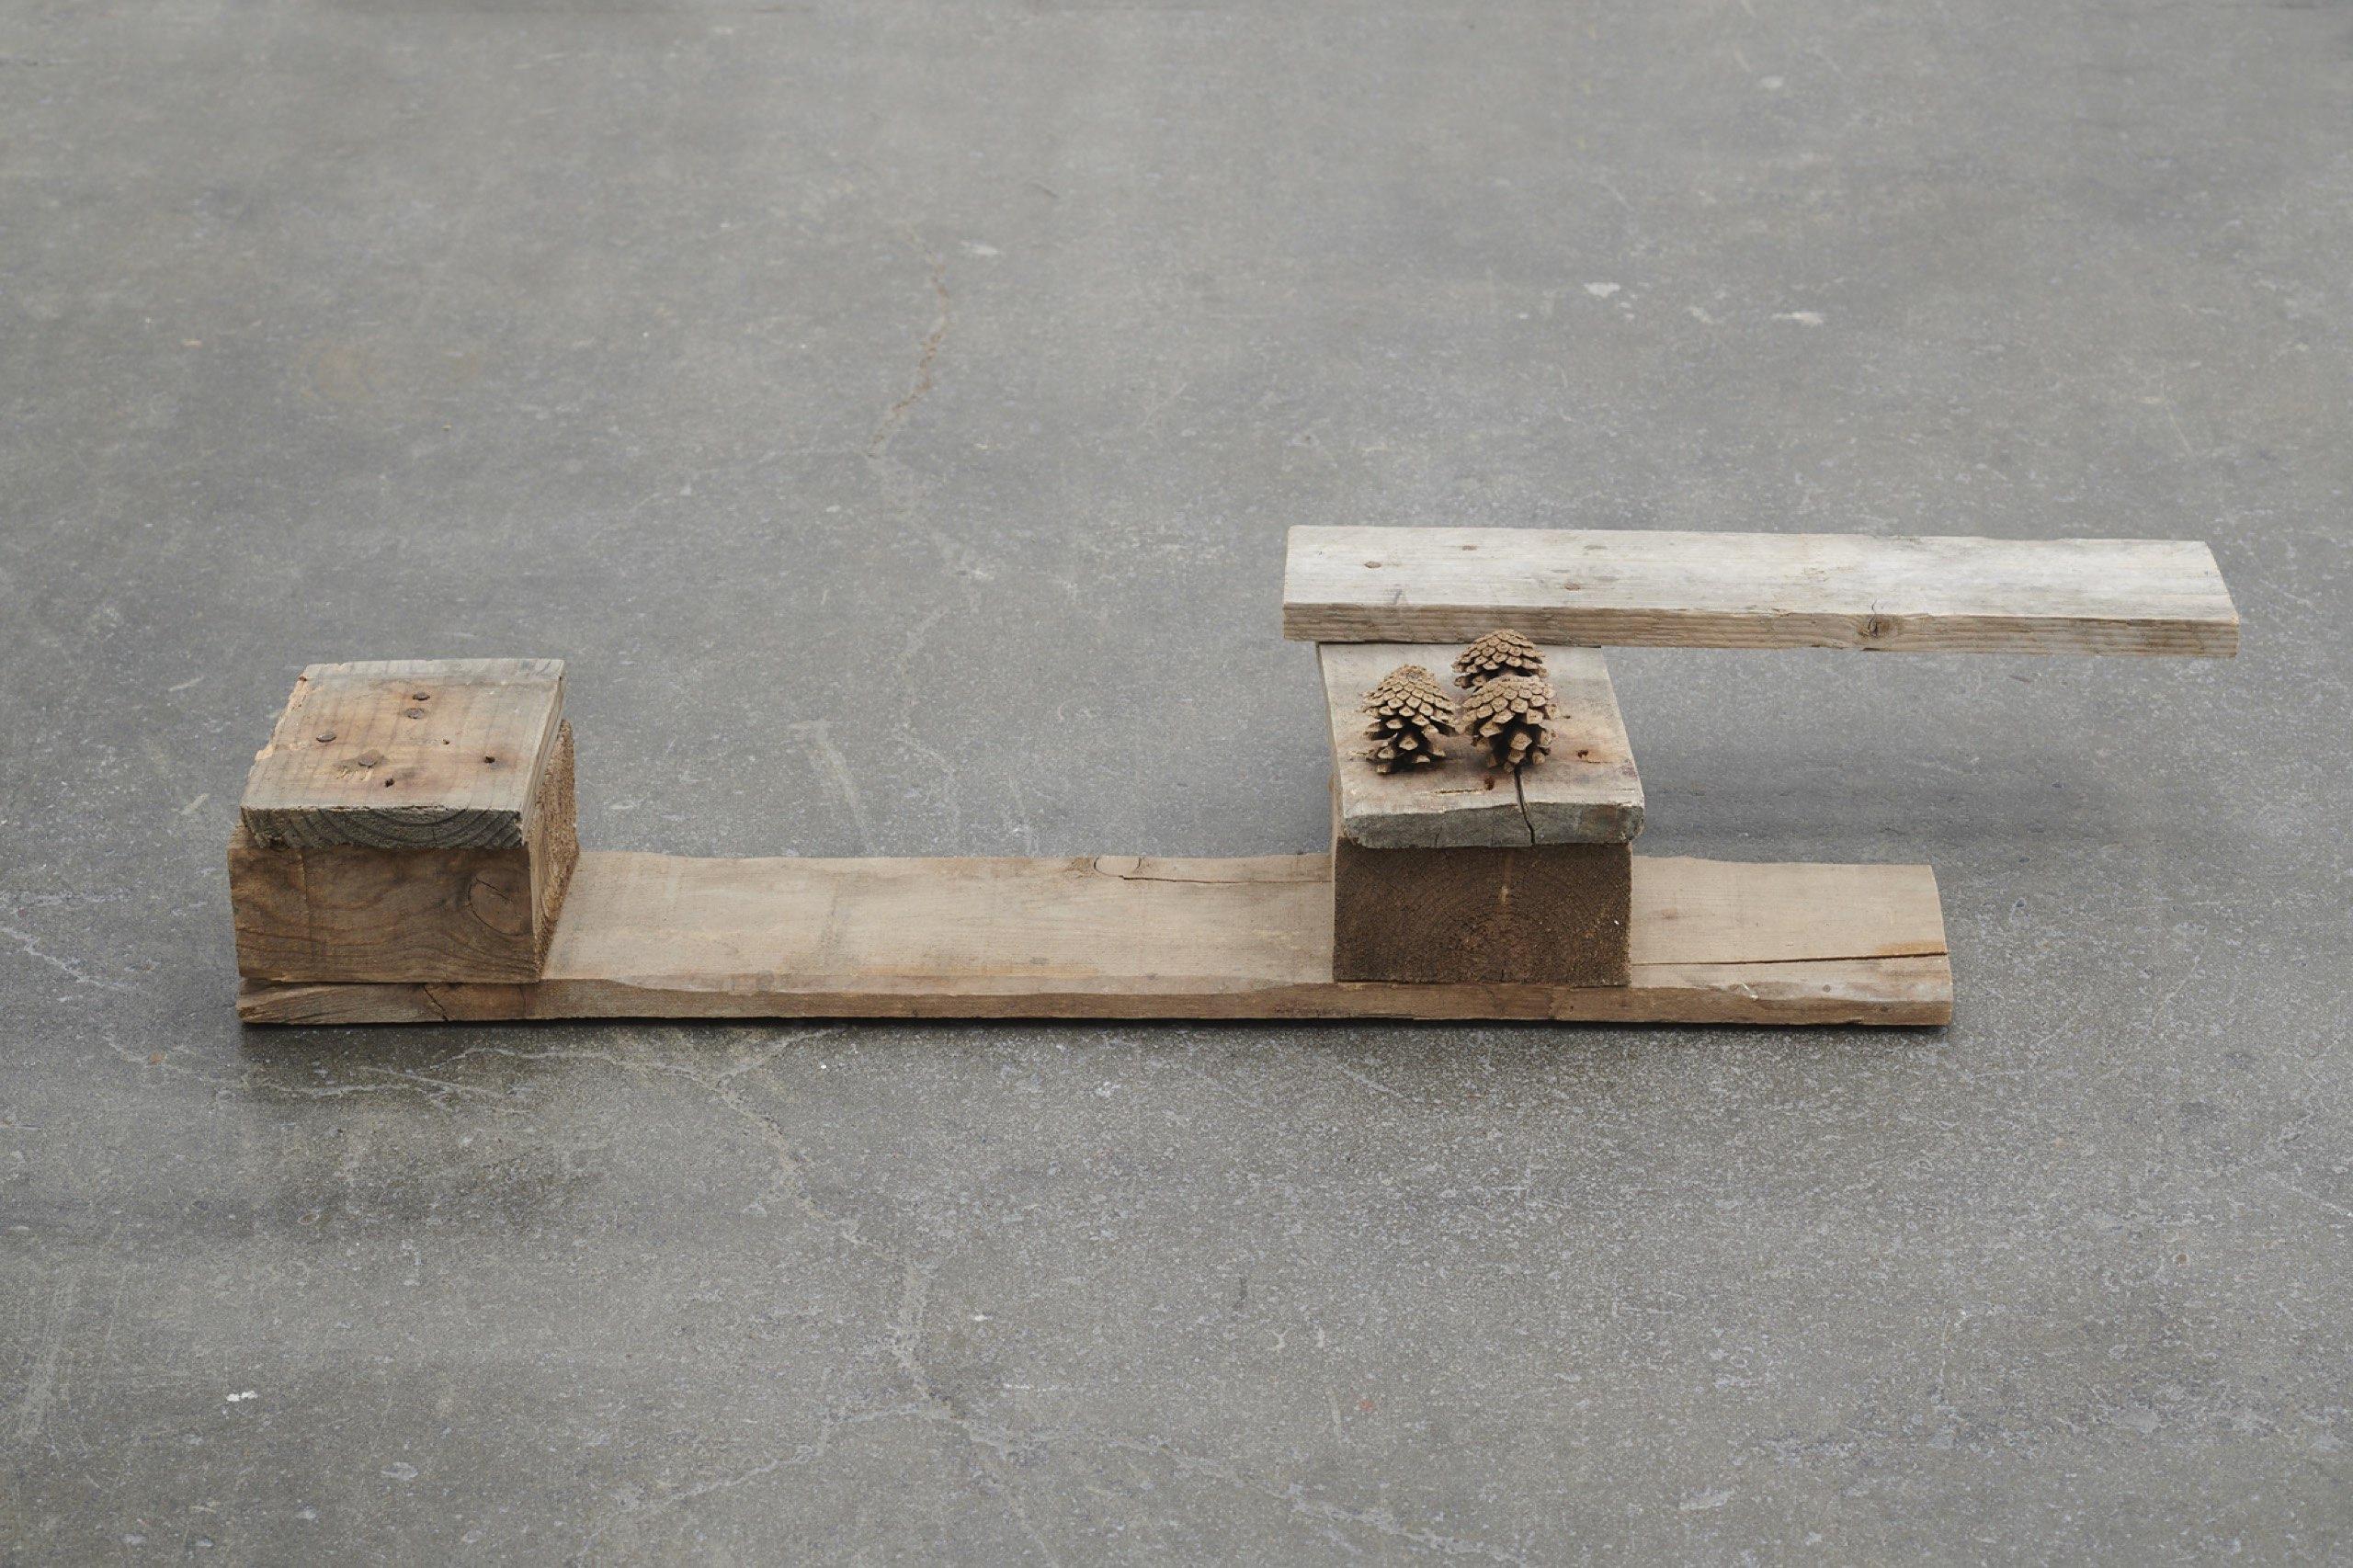 Helen Mirra, Ballou, 2006, Pallet wood, pine cones